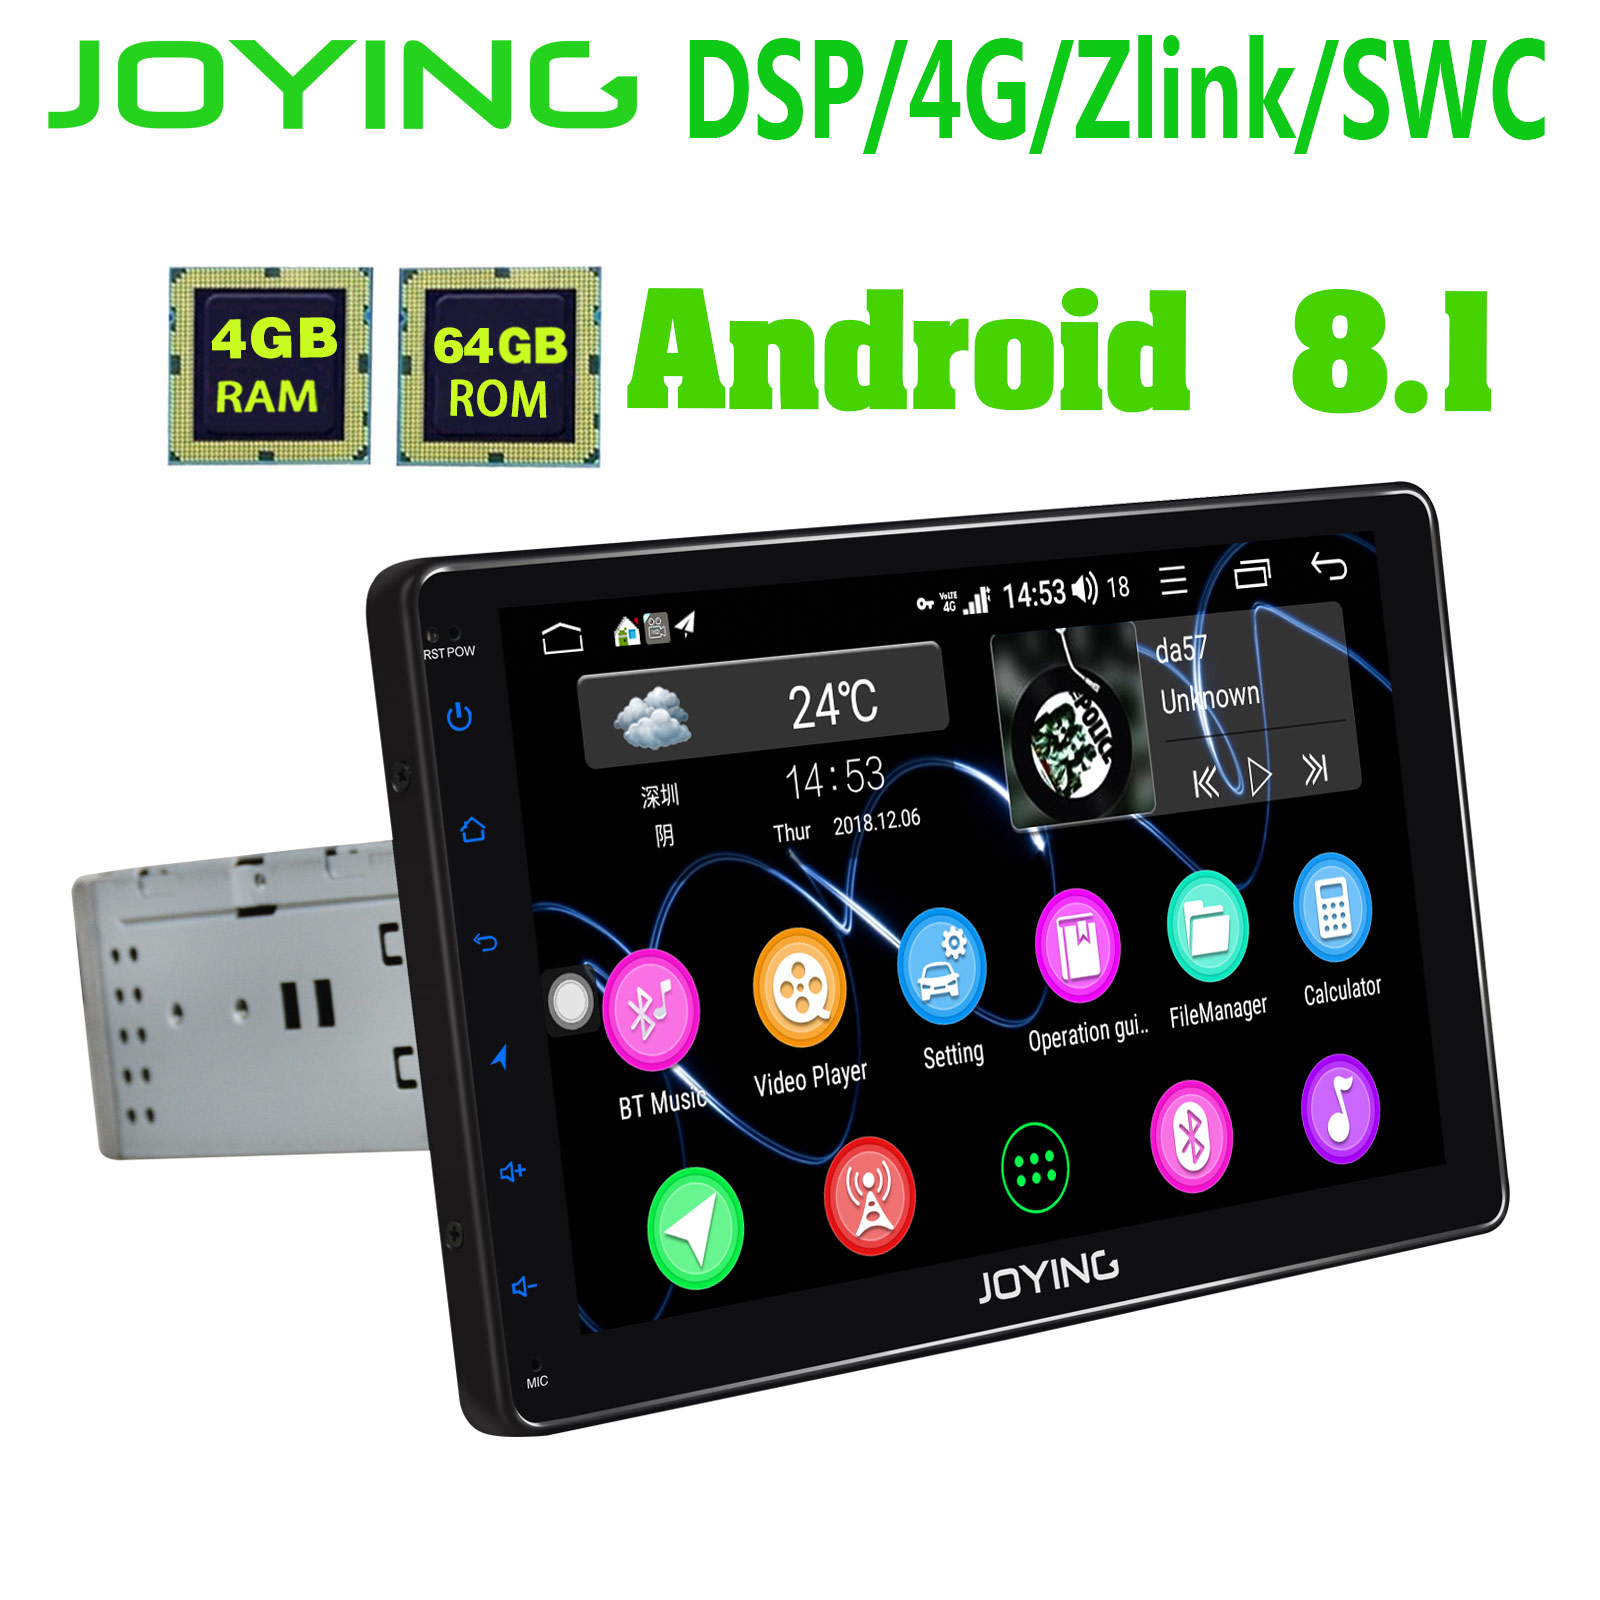 Freeauto Android 6.0 Universal car stereo 17,8 cm doppio 2 DIN in dash Head Unit GPS Nav AM FM radio Player Bluetooth ricevitore USB SD 3 G WiFi DVR cam-in